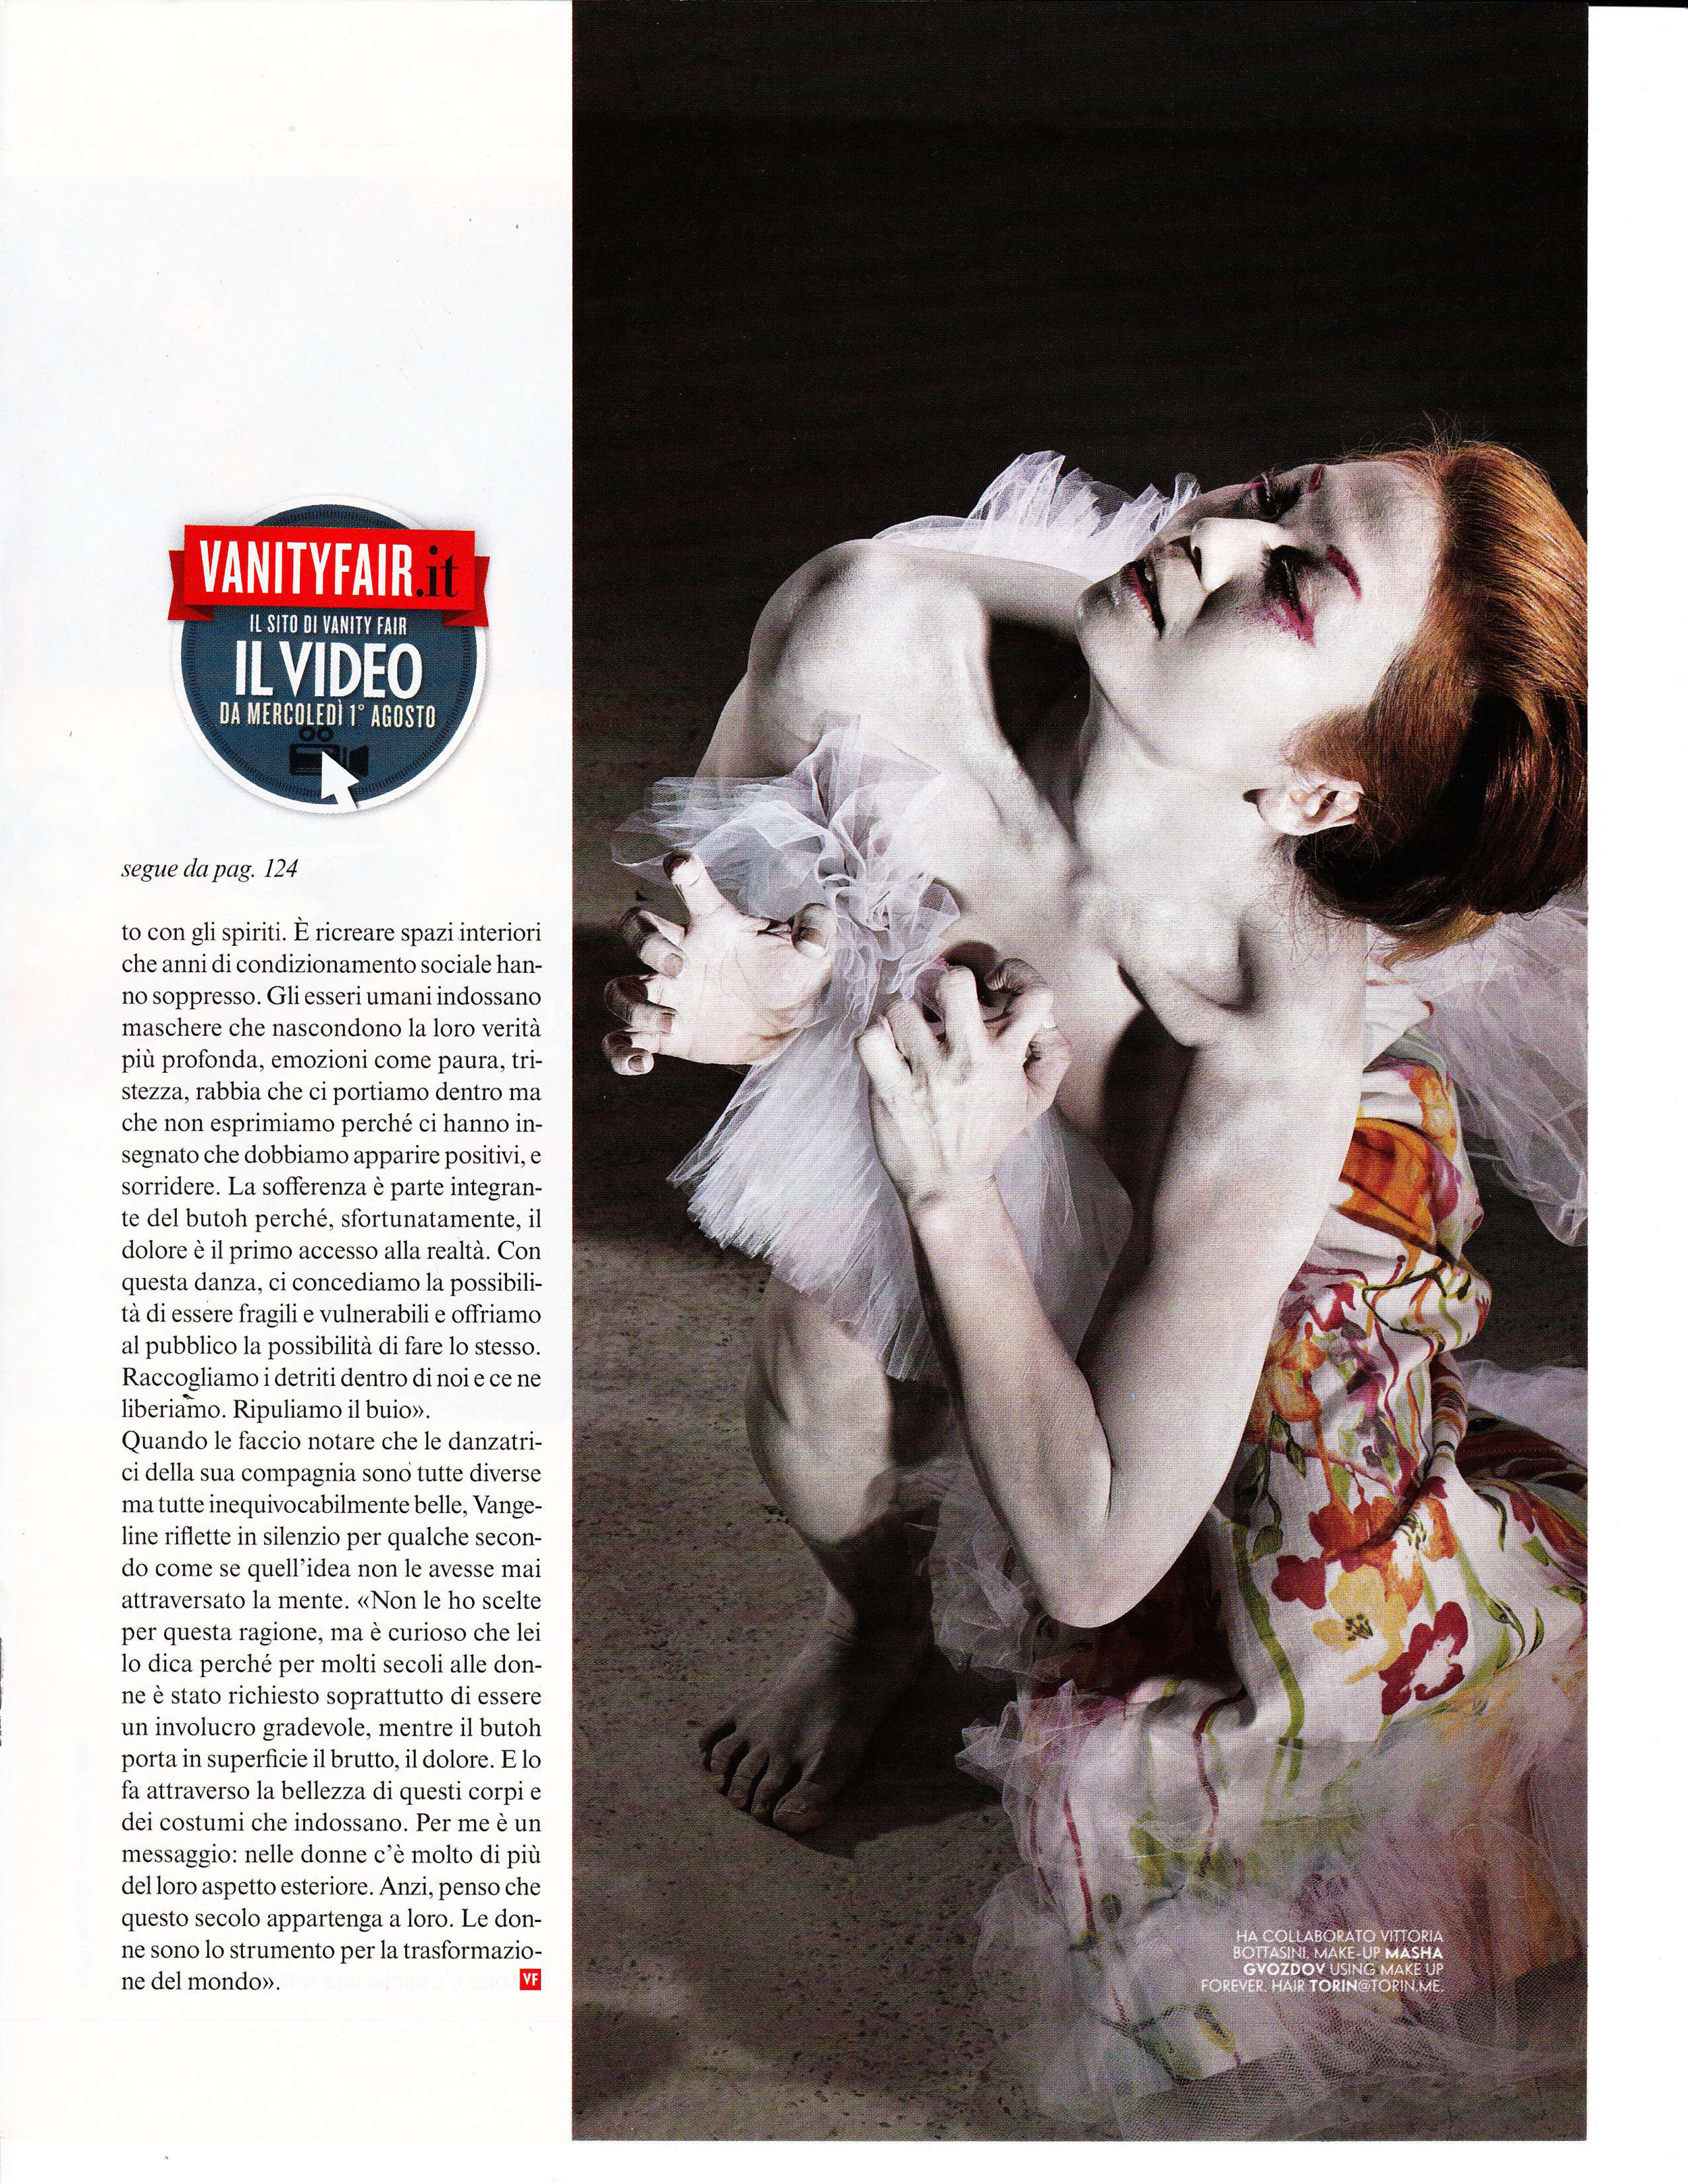 15 Vangeline Theater Costume Collection-14.jpg